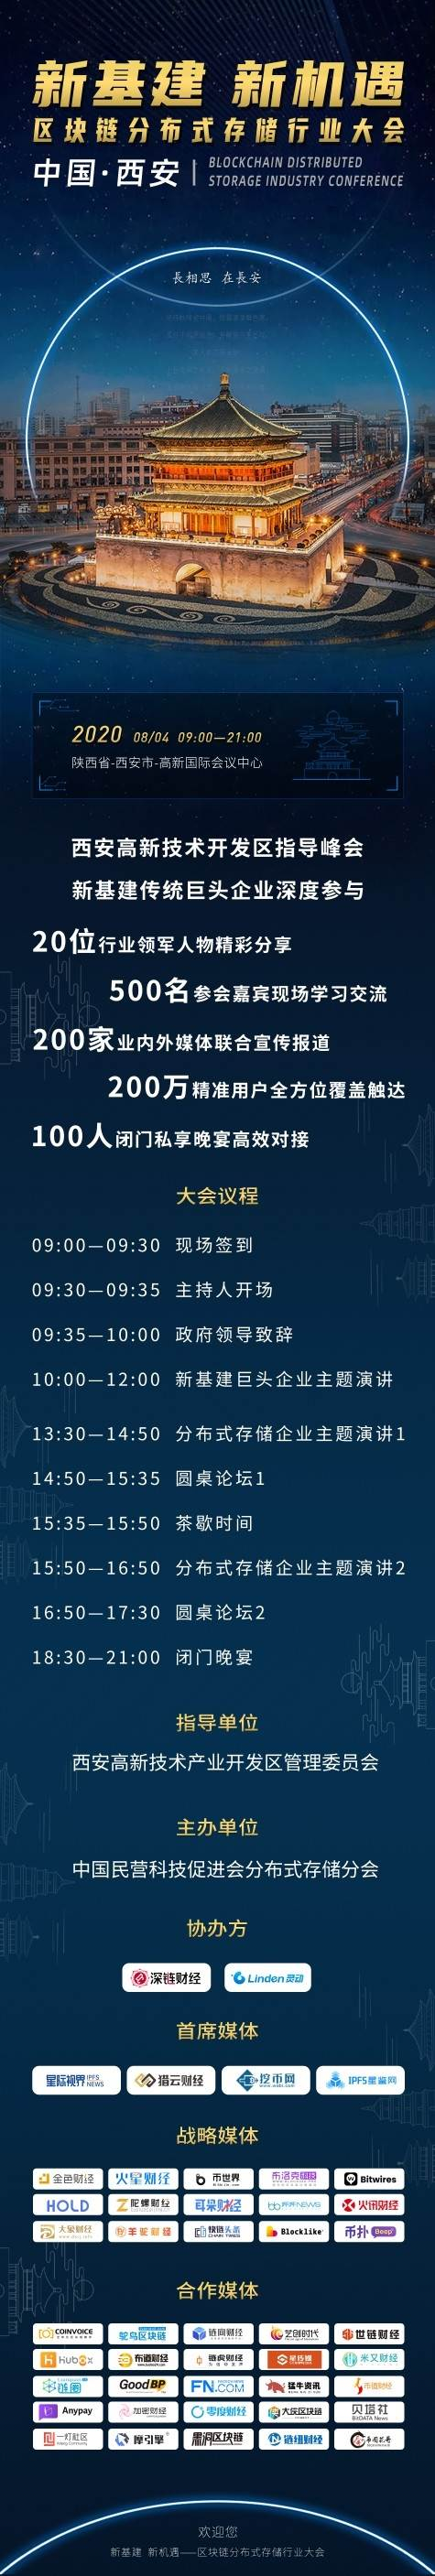 http://www.huodongxing.com/file/20180728/2093130633654/923853740322443.jpg